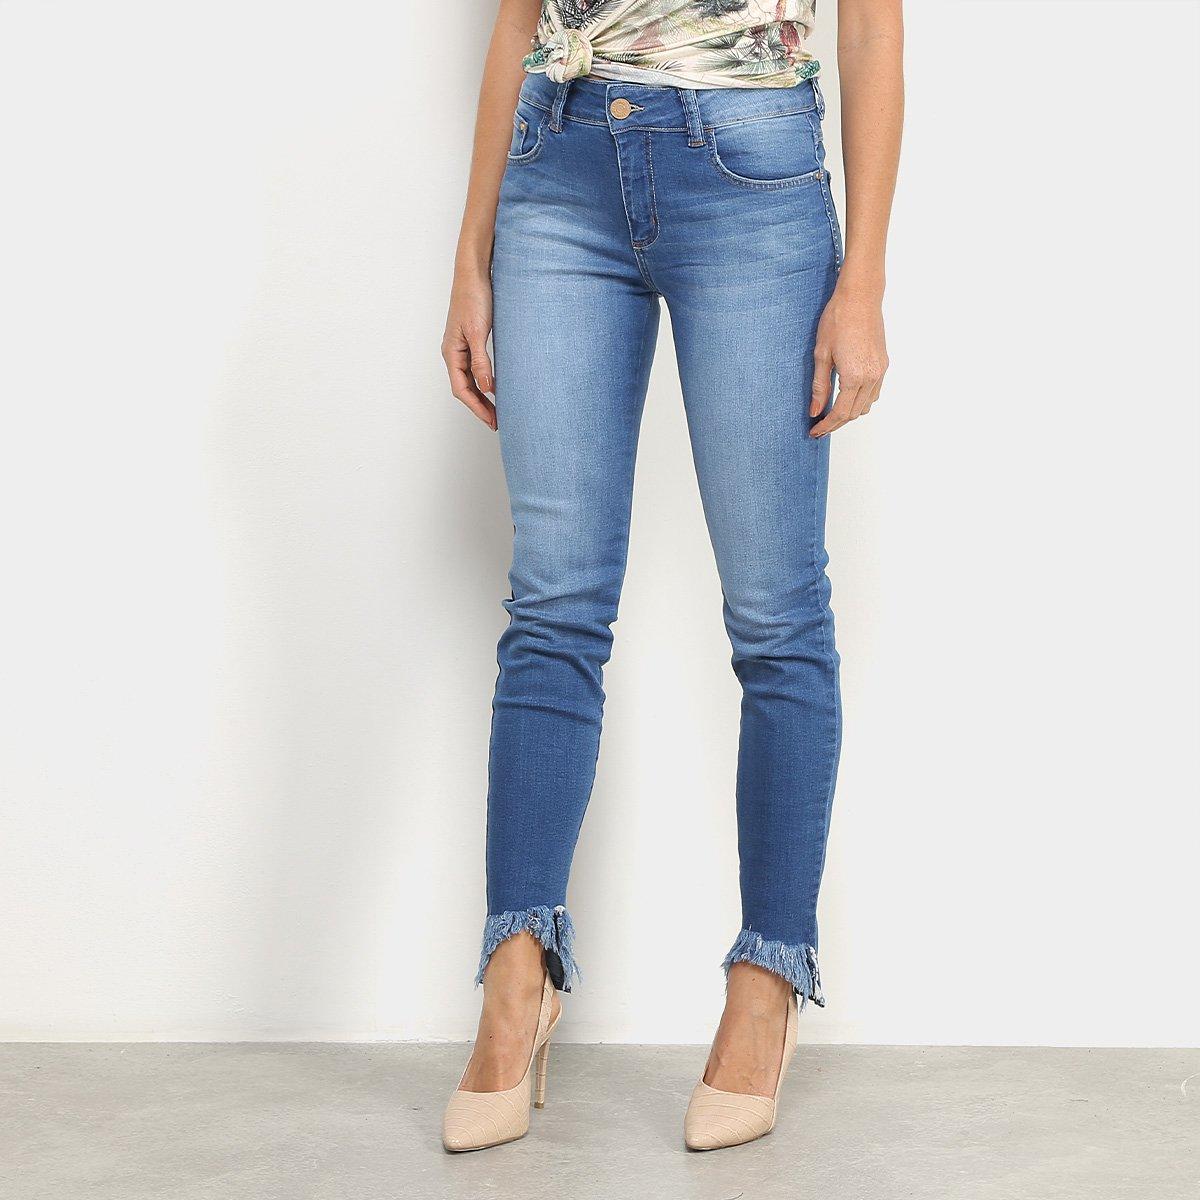 Calça Jeans Forum Marisa Estonada Feminina